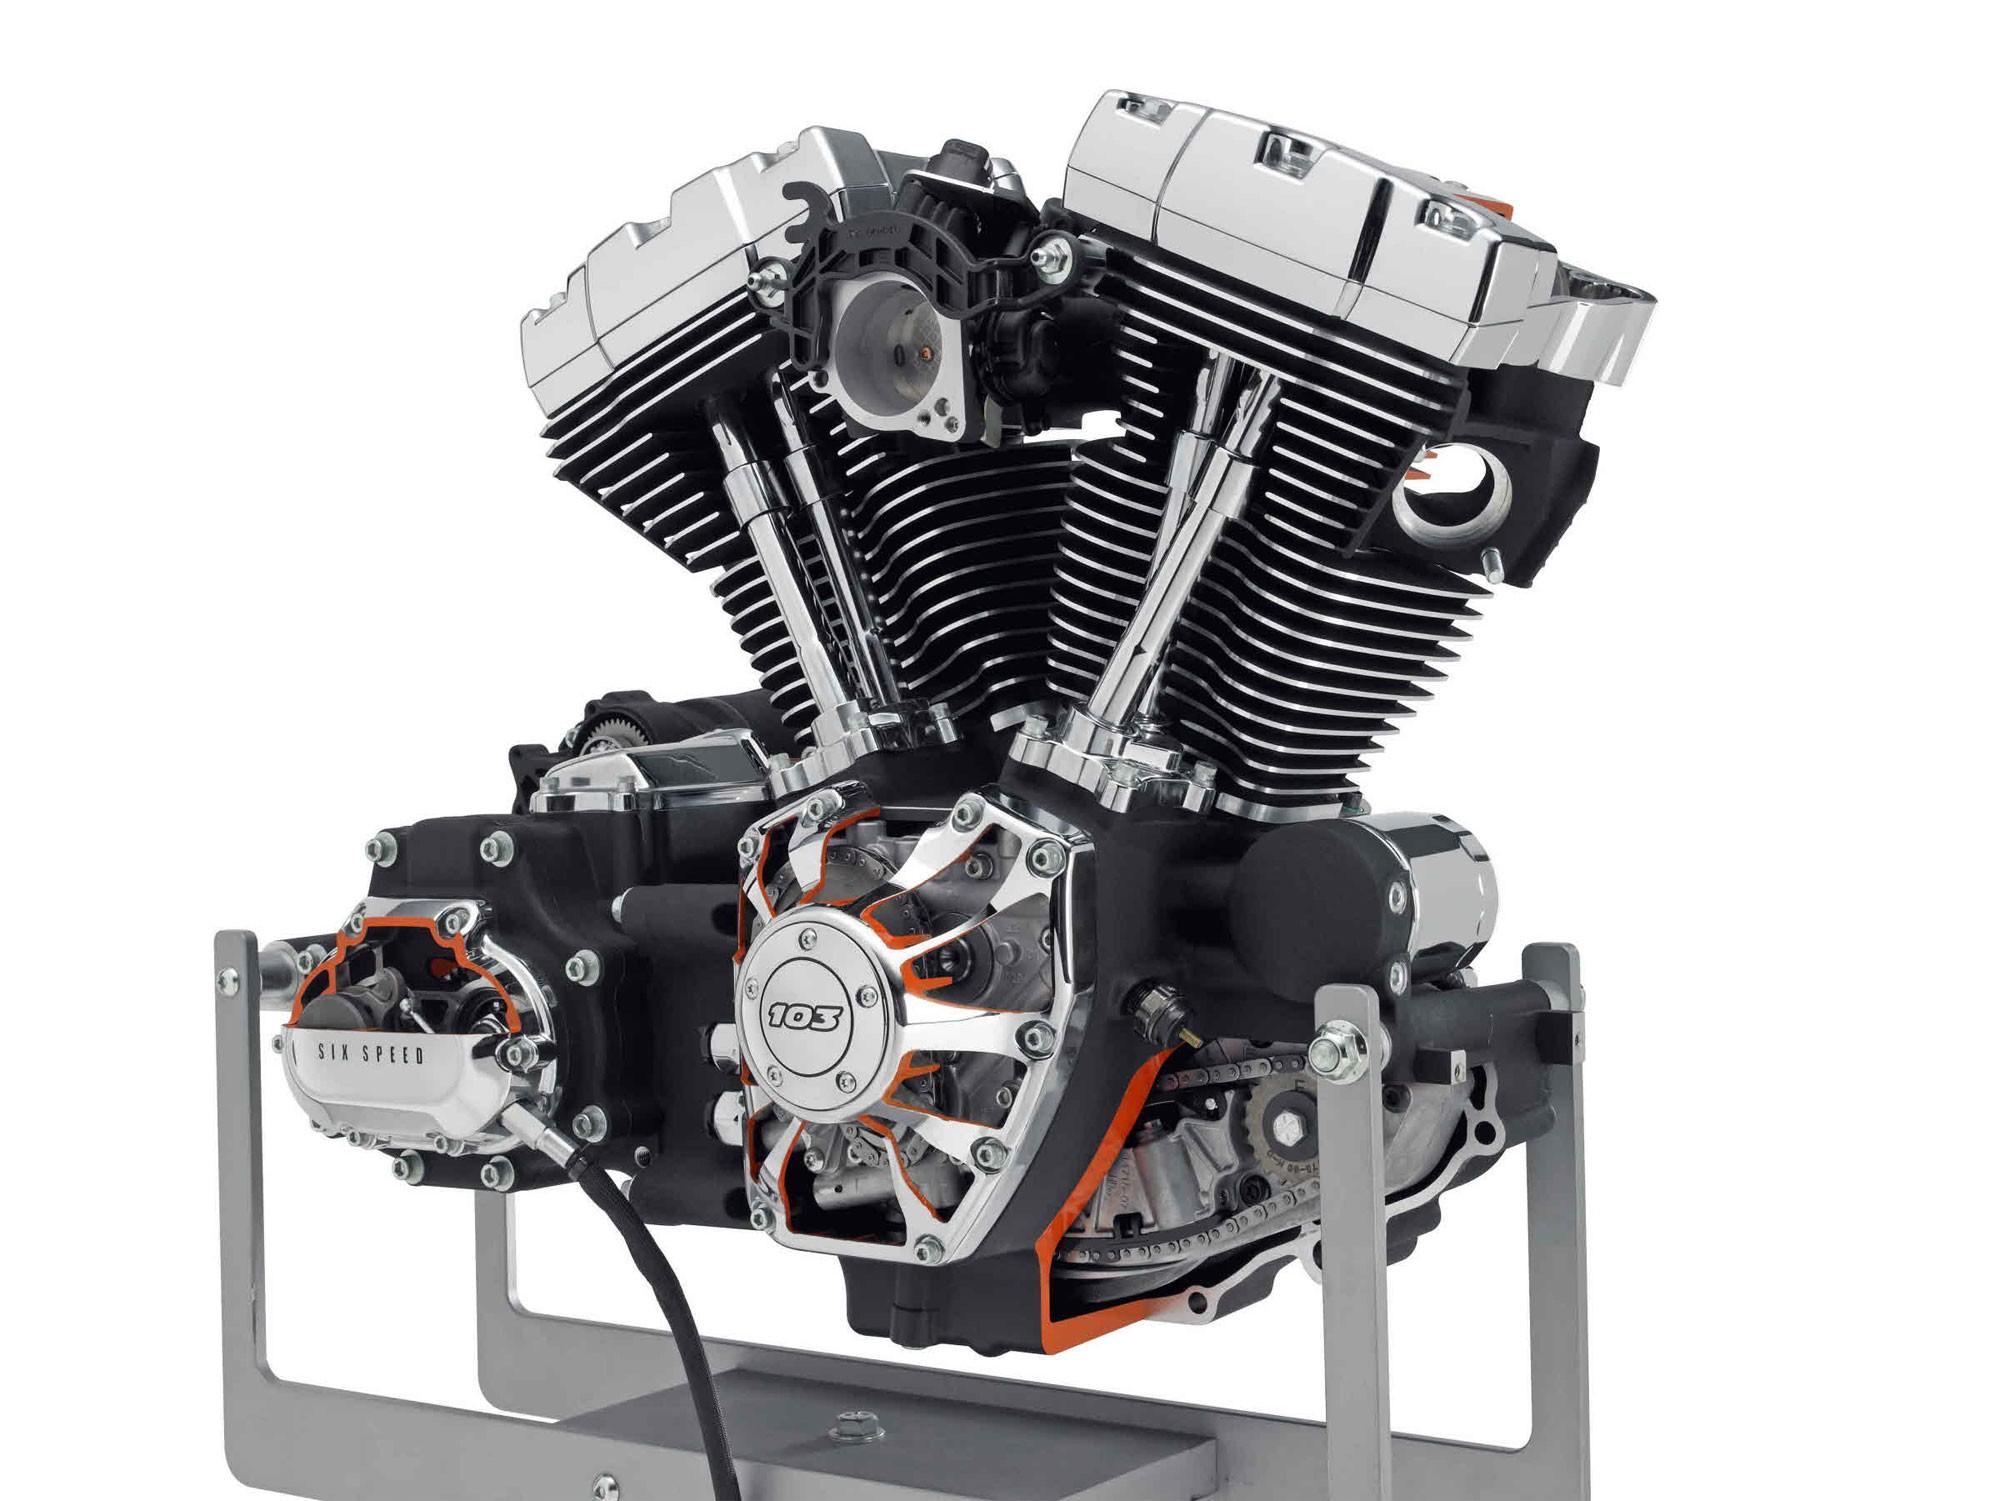 Overhead Cam Engine Diagram Fresh Harley Davidson Engine Diagram Of Overhead Cam Engine Diagram